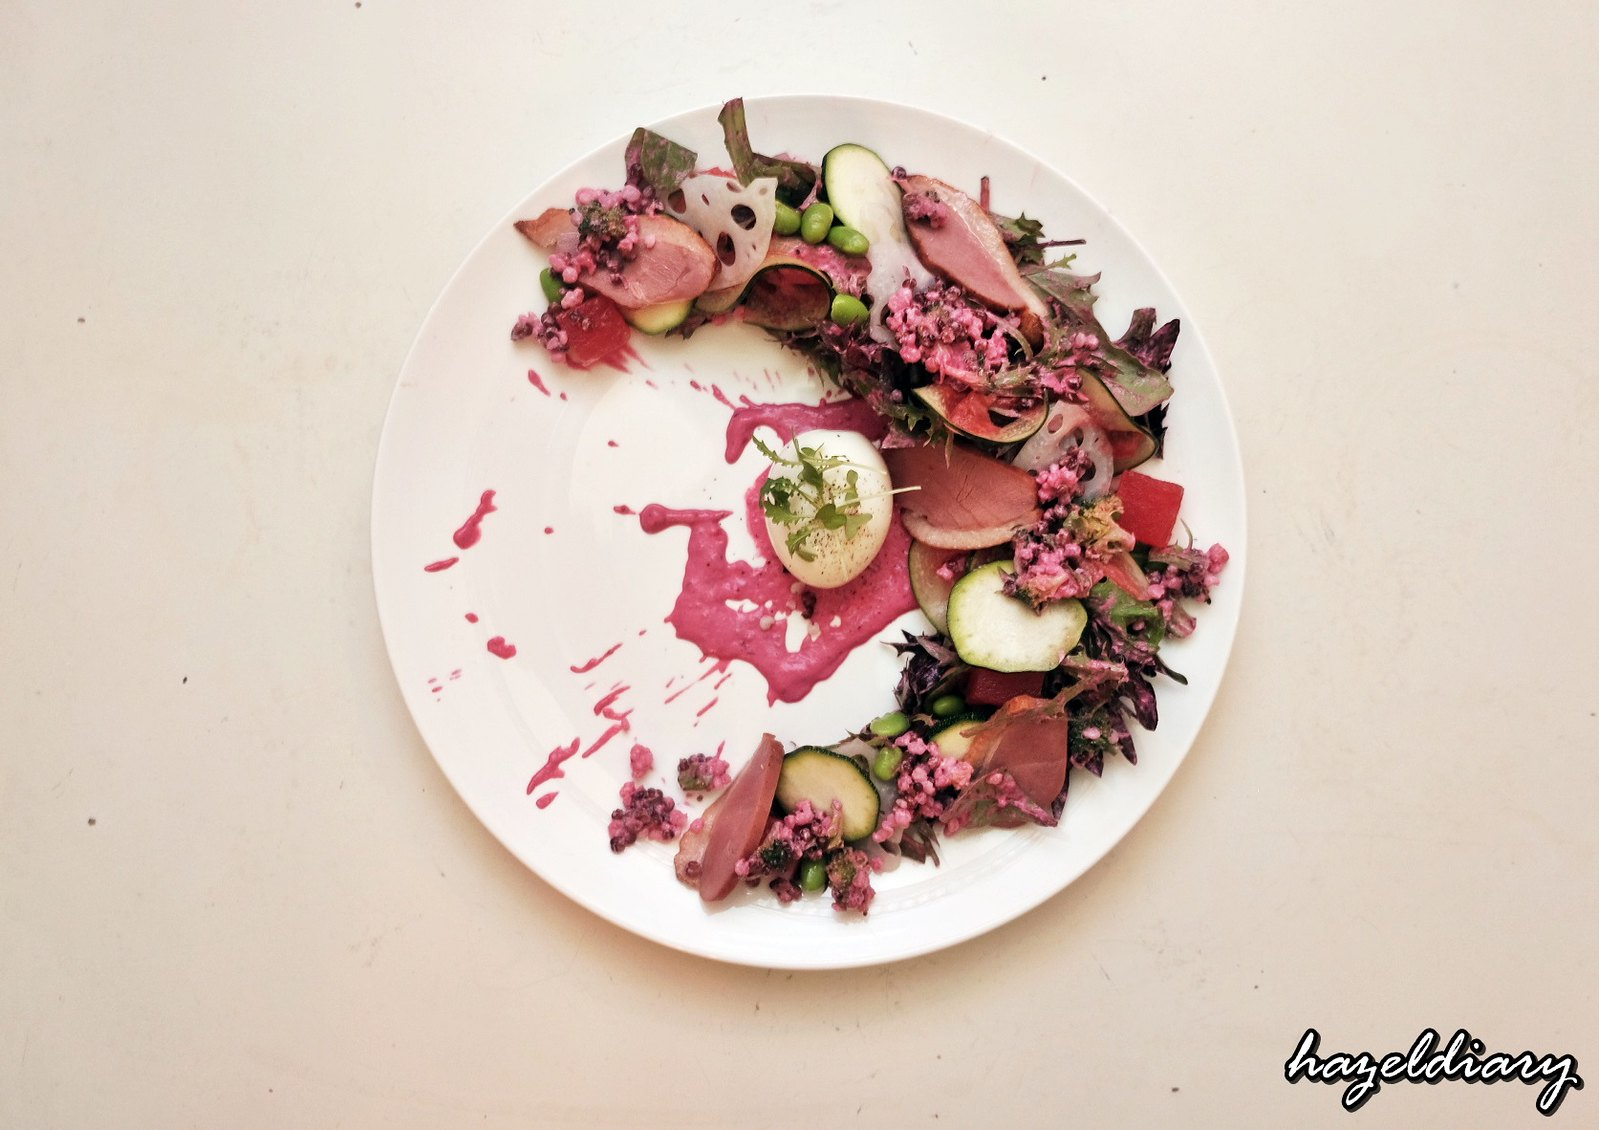 Antoinette-Watermelon & Duck Salad